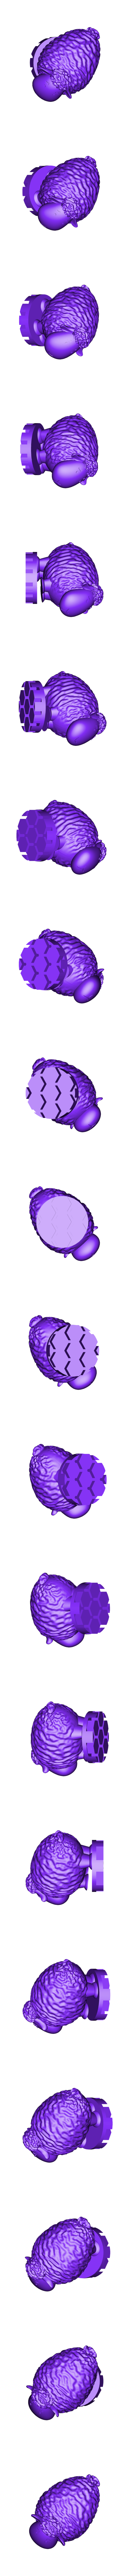 Zoetrope_Prusament Spool_by Dominik Cisar_Sheep 08.stl Download free STL file SPIROGRAPH - PRUSAMENT SPOOL - reuse idea • 3D print model, cisardom